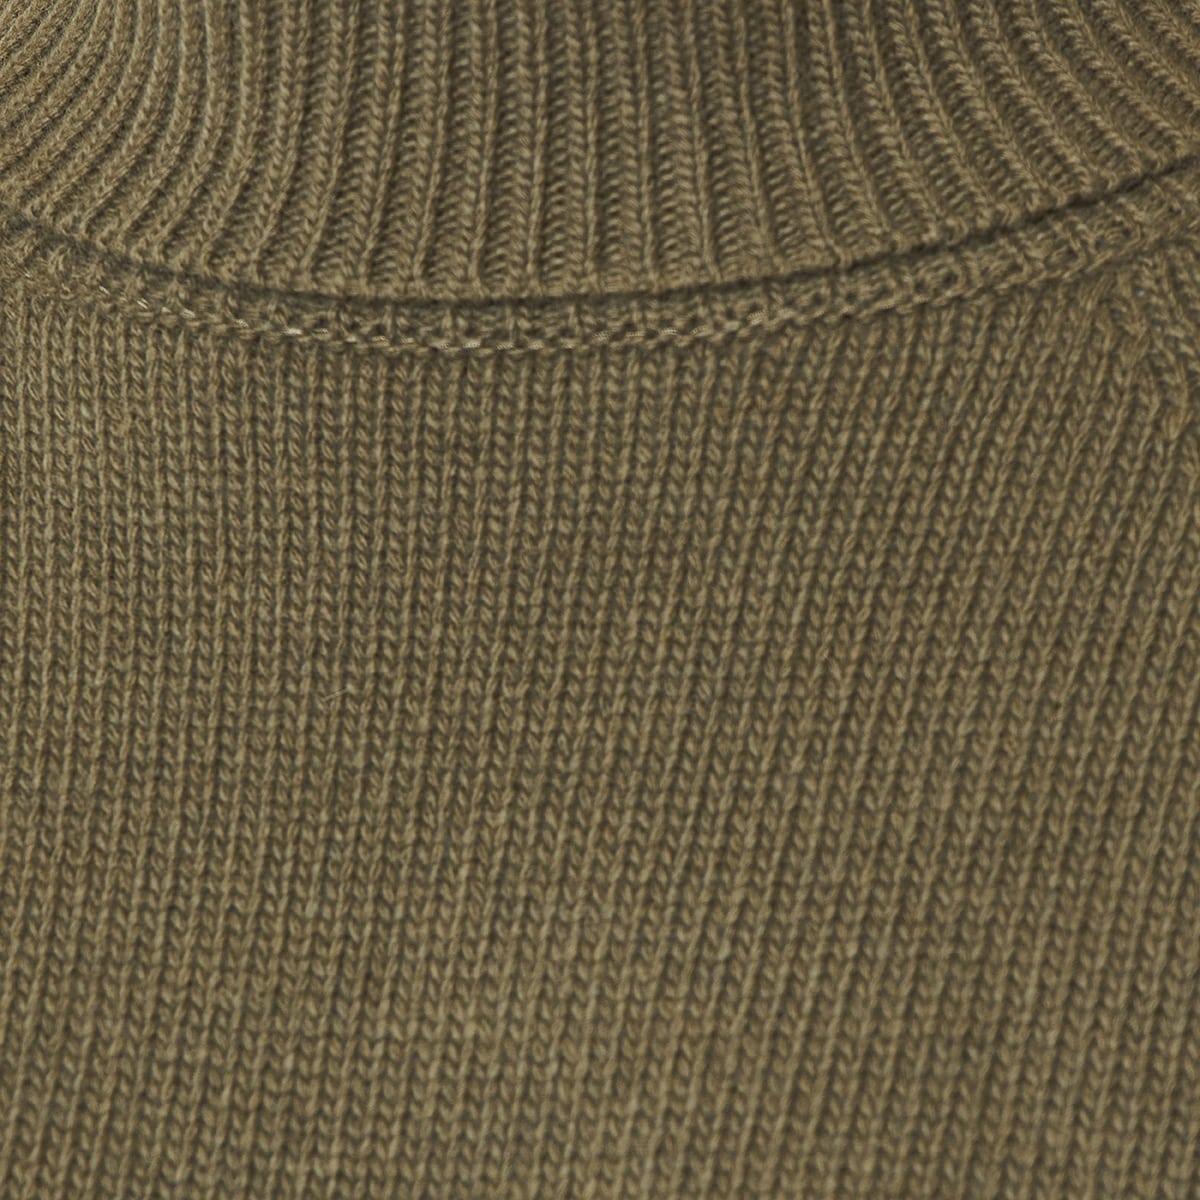 Wide-sleeved turtleneck sweater